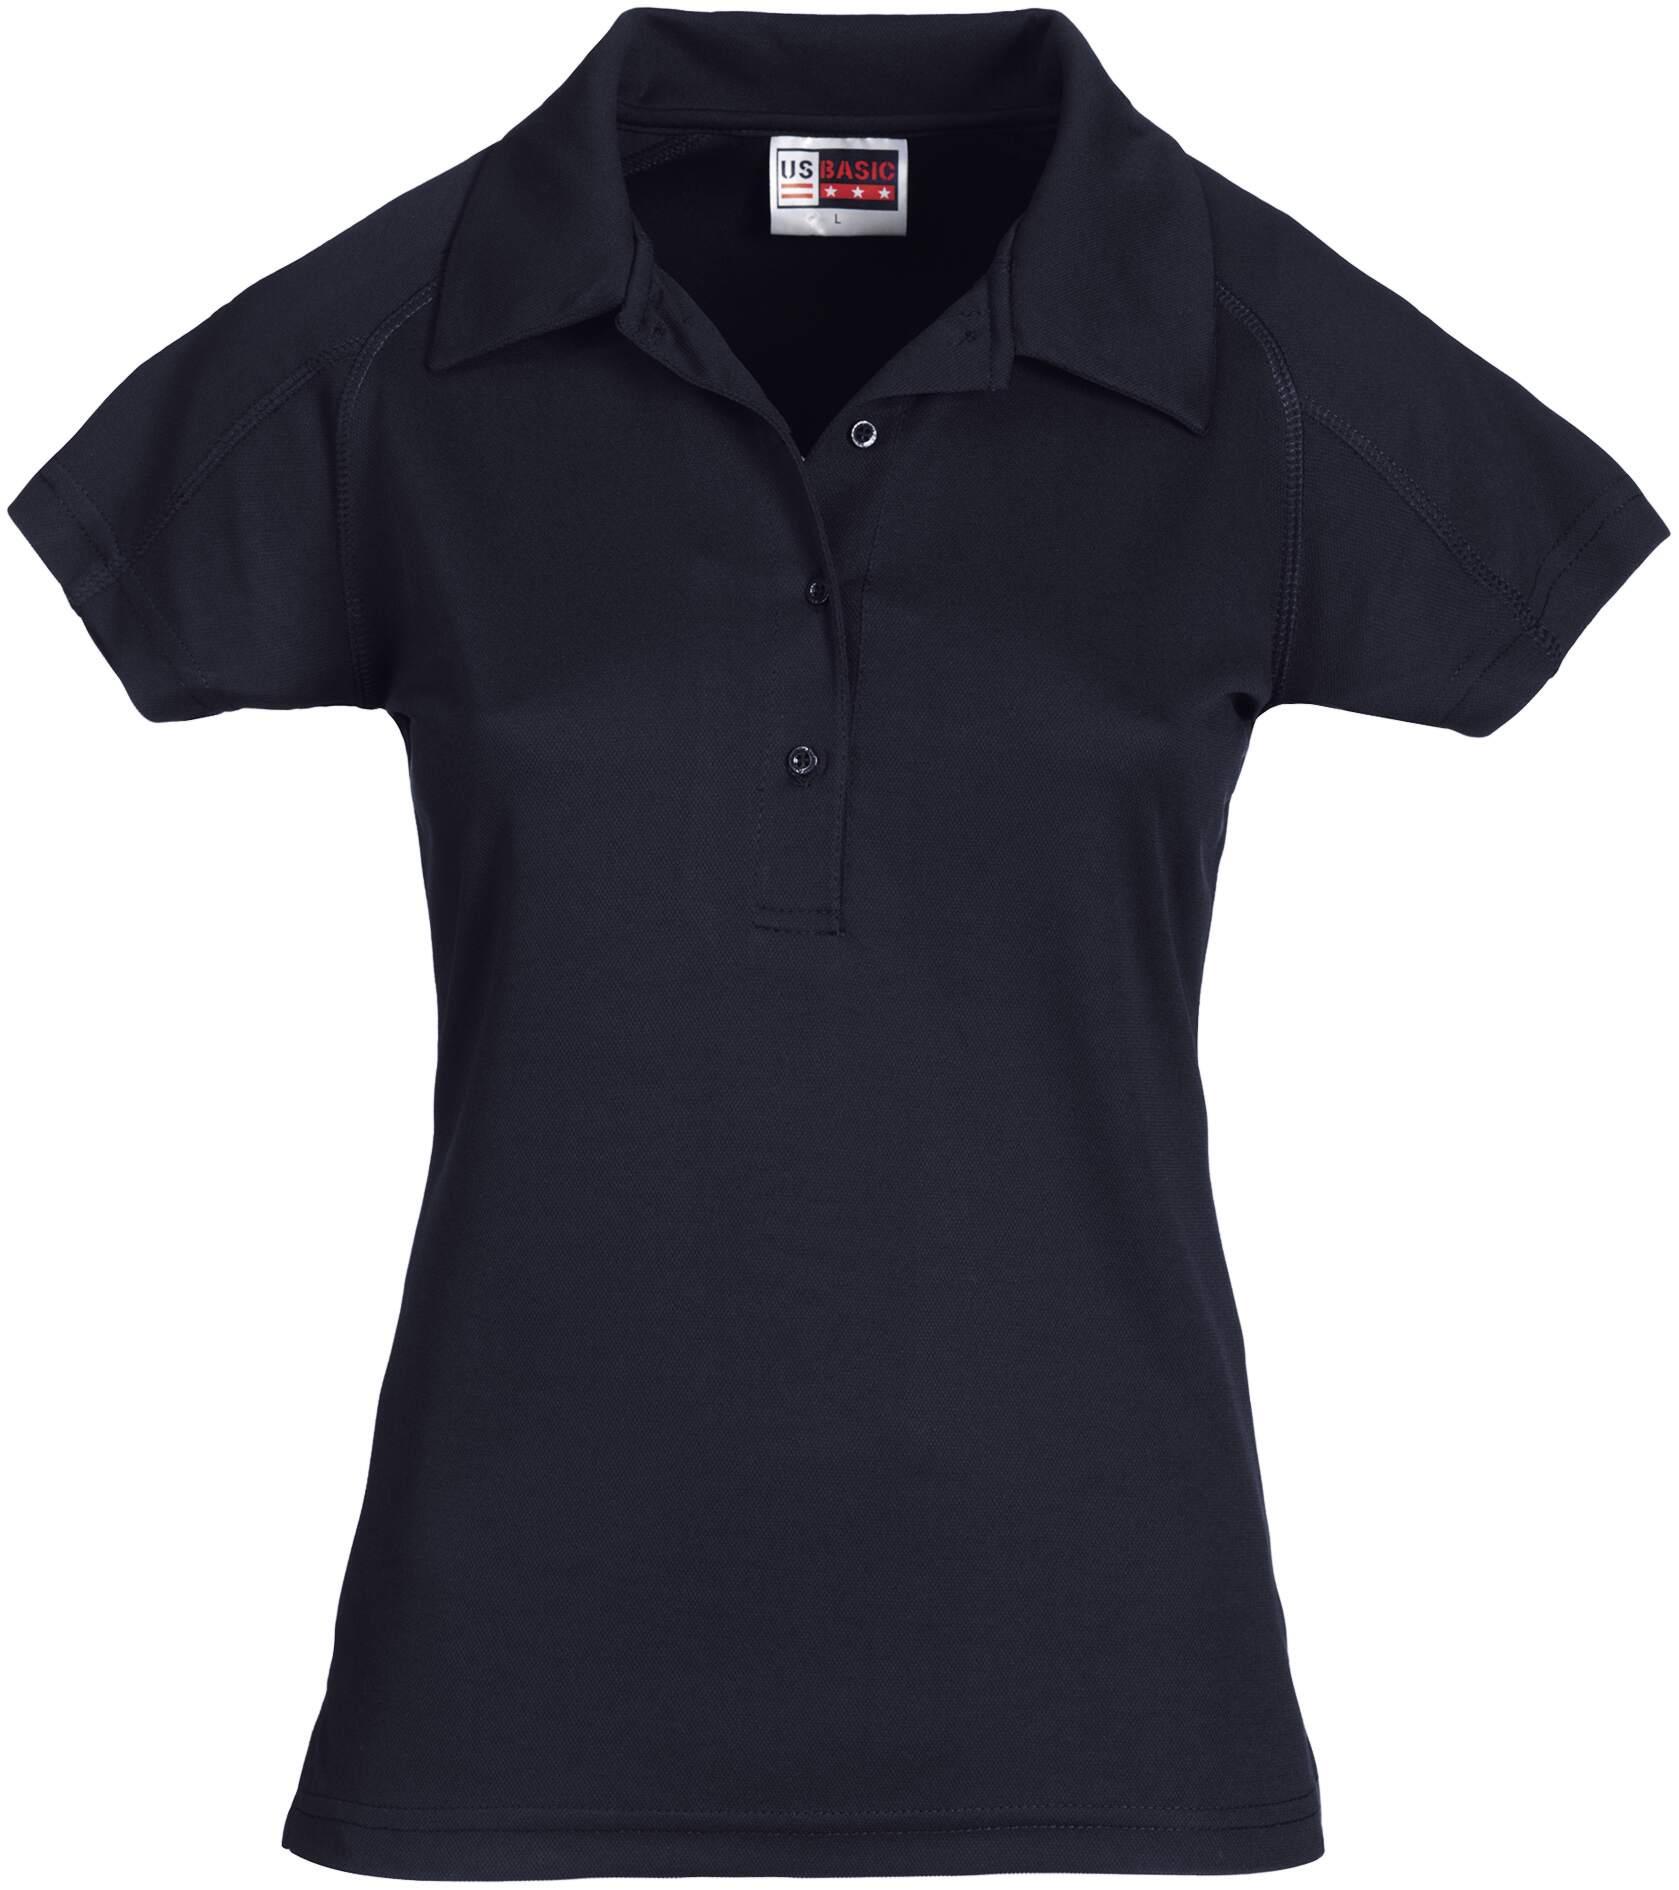 Koszulki Polo US 31097 Cool Fit - 31097_granatowy_US - Kolor: Granatowy